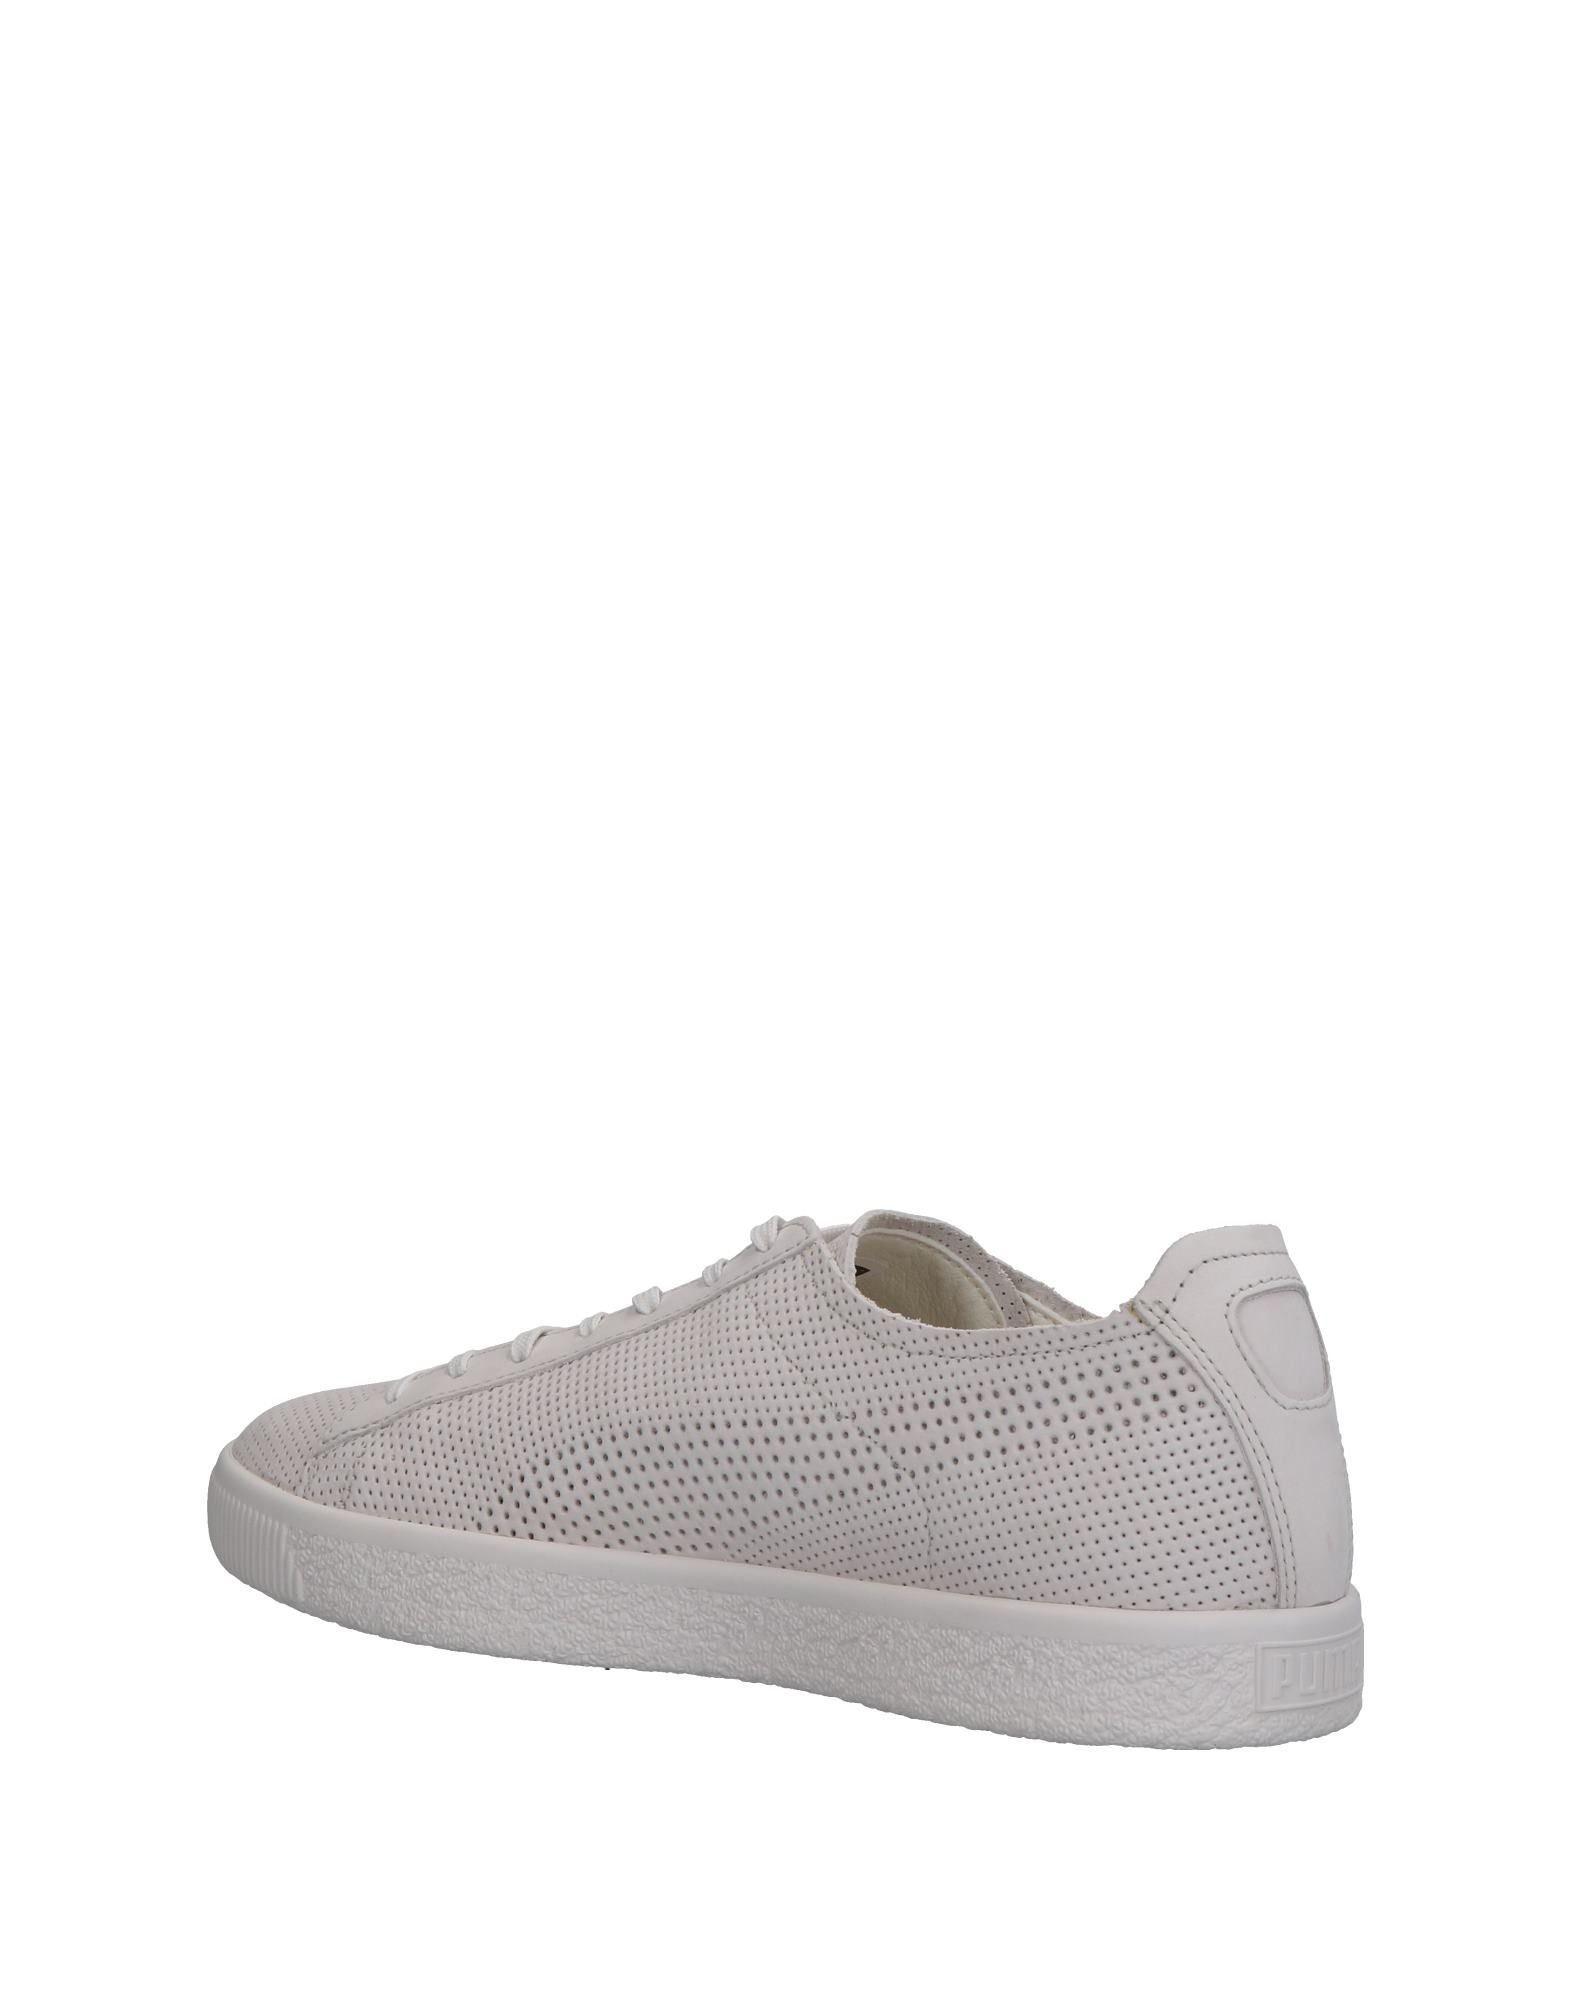 Stampd X Stampd Puma Sneakers - Men Stampd X X Puma Sneakers online on  Australia - 11326777AU c98533